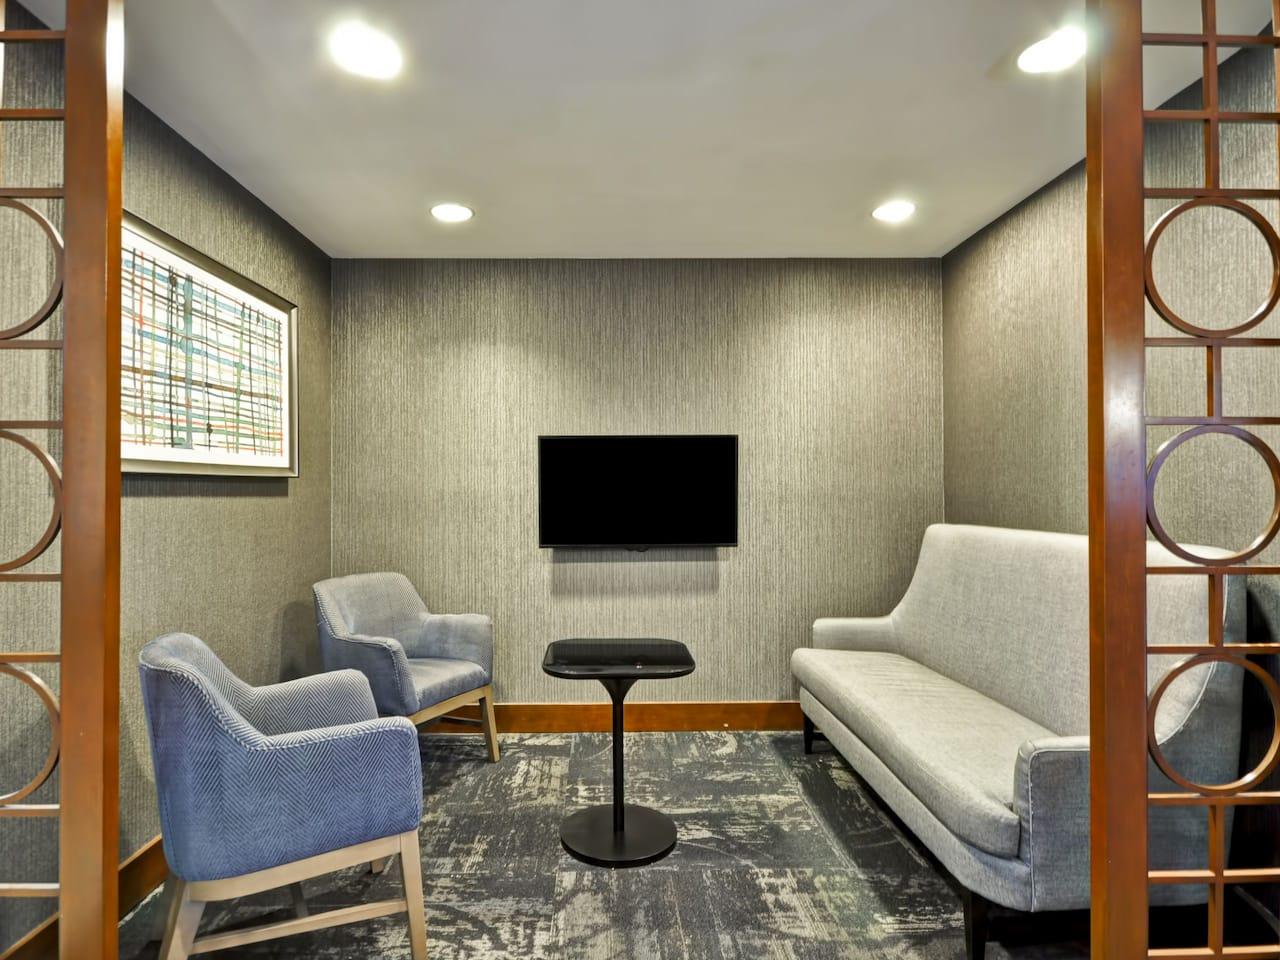 Hyatt Place Tampa Airport/Westshore Lobby Lounge